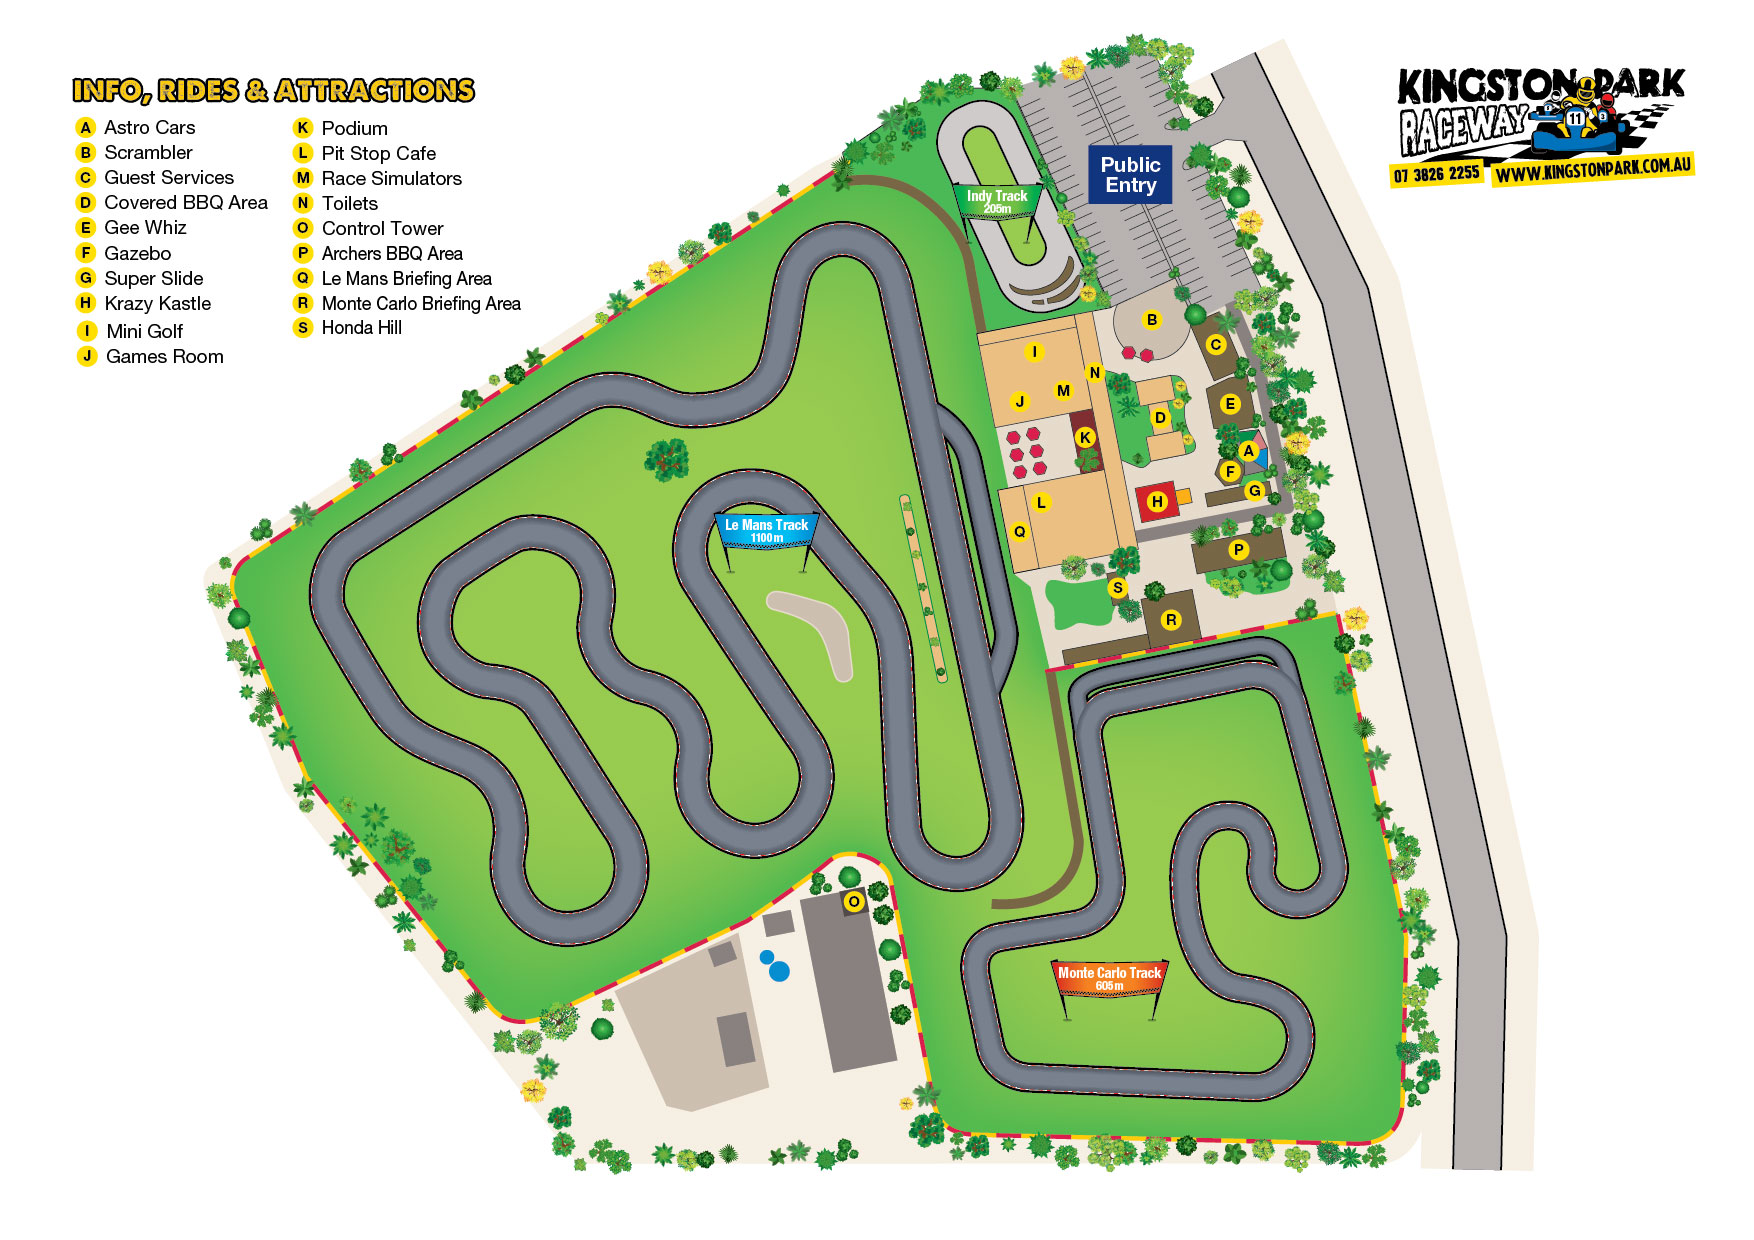 Go Kart Track Map – 3 Tracks – Kingston Park Raceway